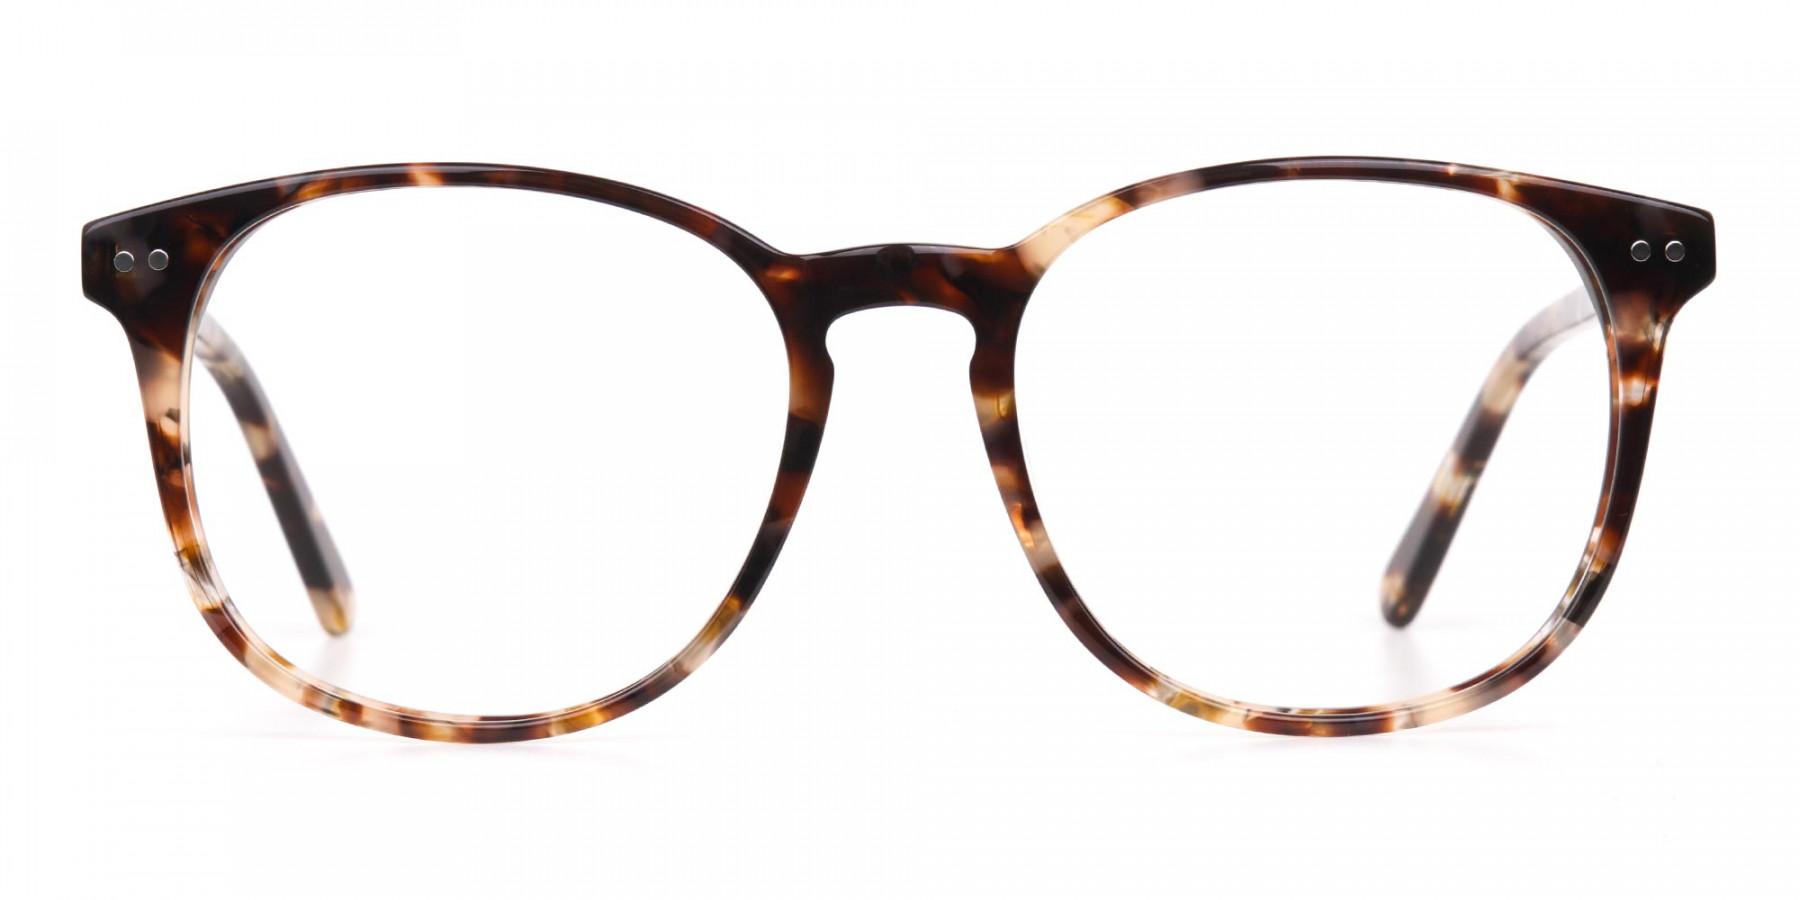 Tortoise Acetate Wayfarer Eyeglasses Unisex-1